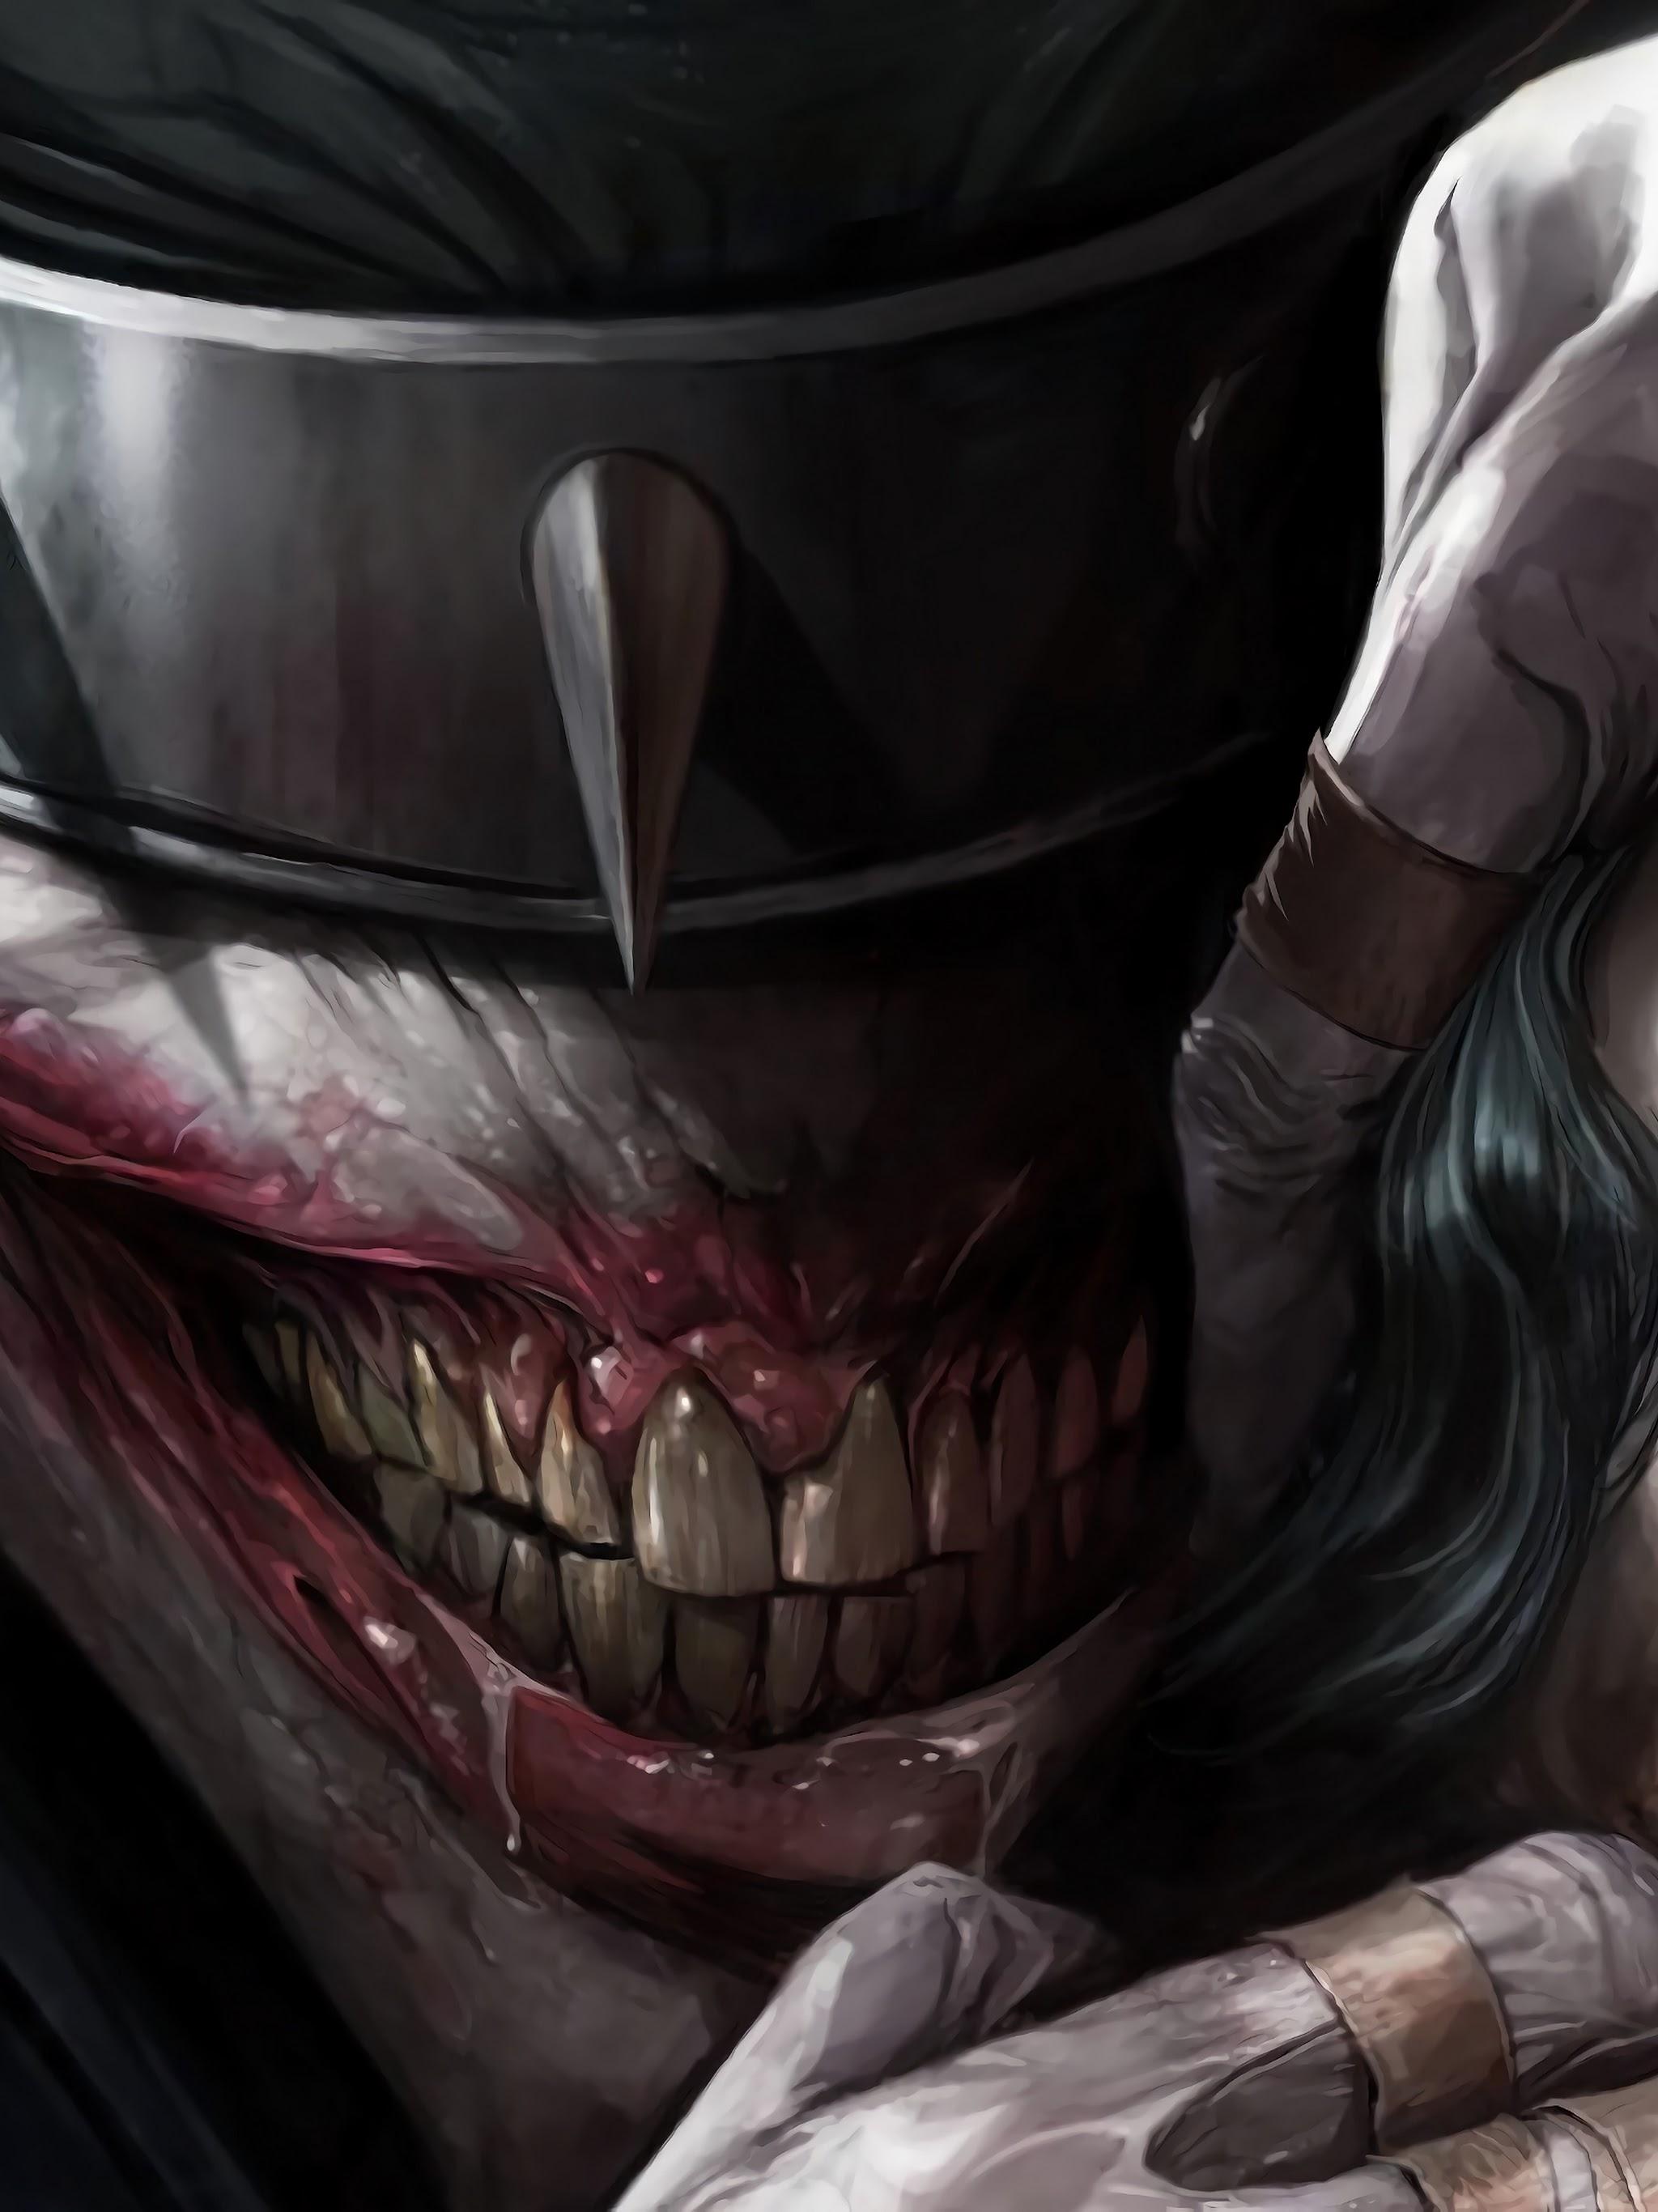 Batman Who Laughs 4k Wallpaper 22